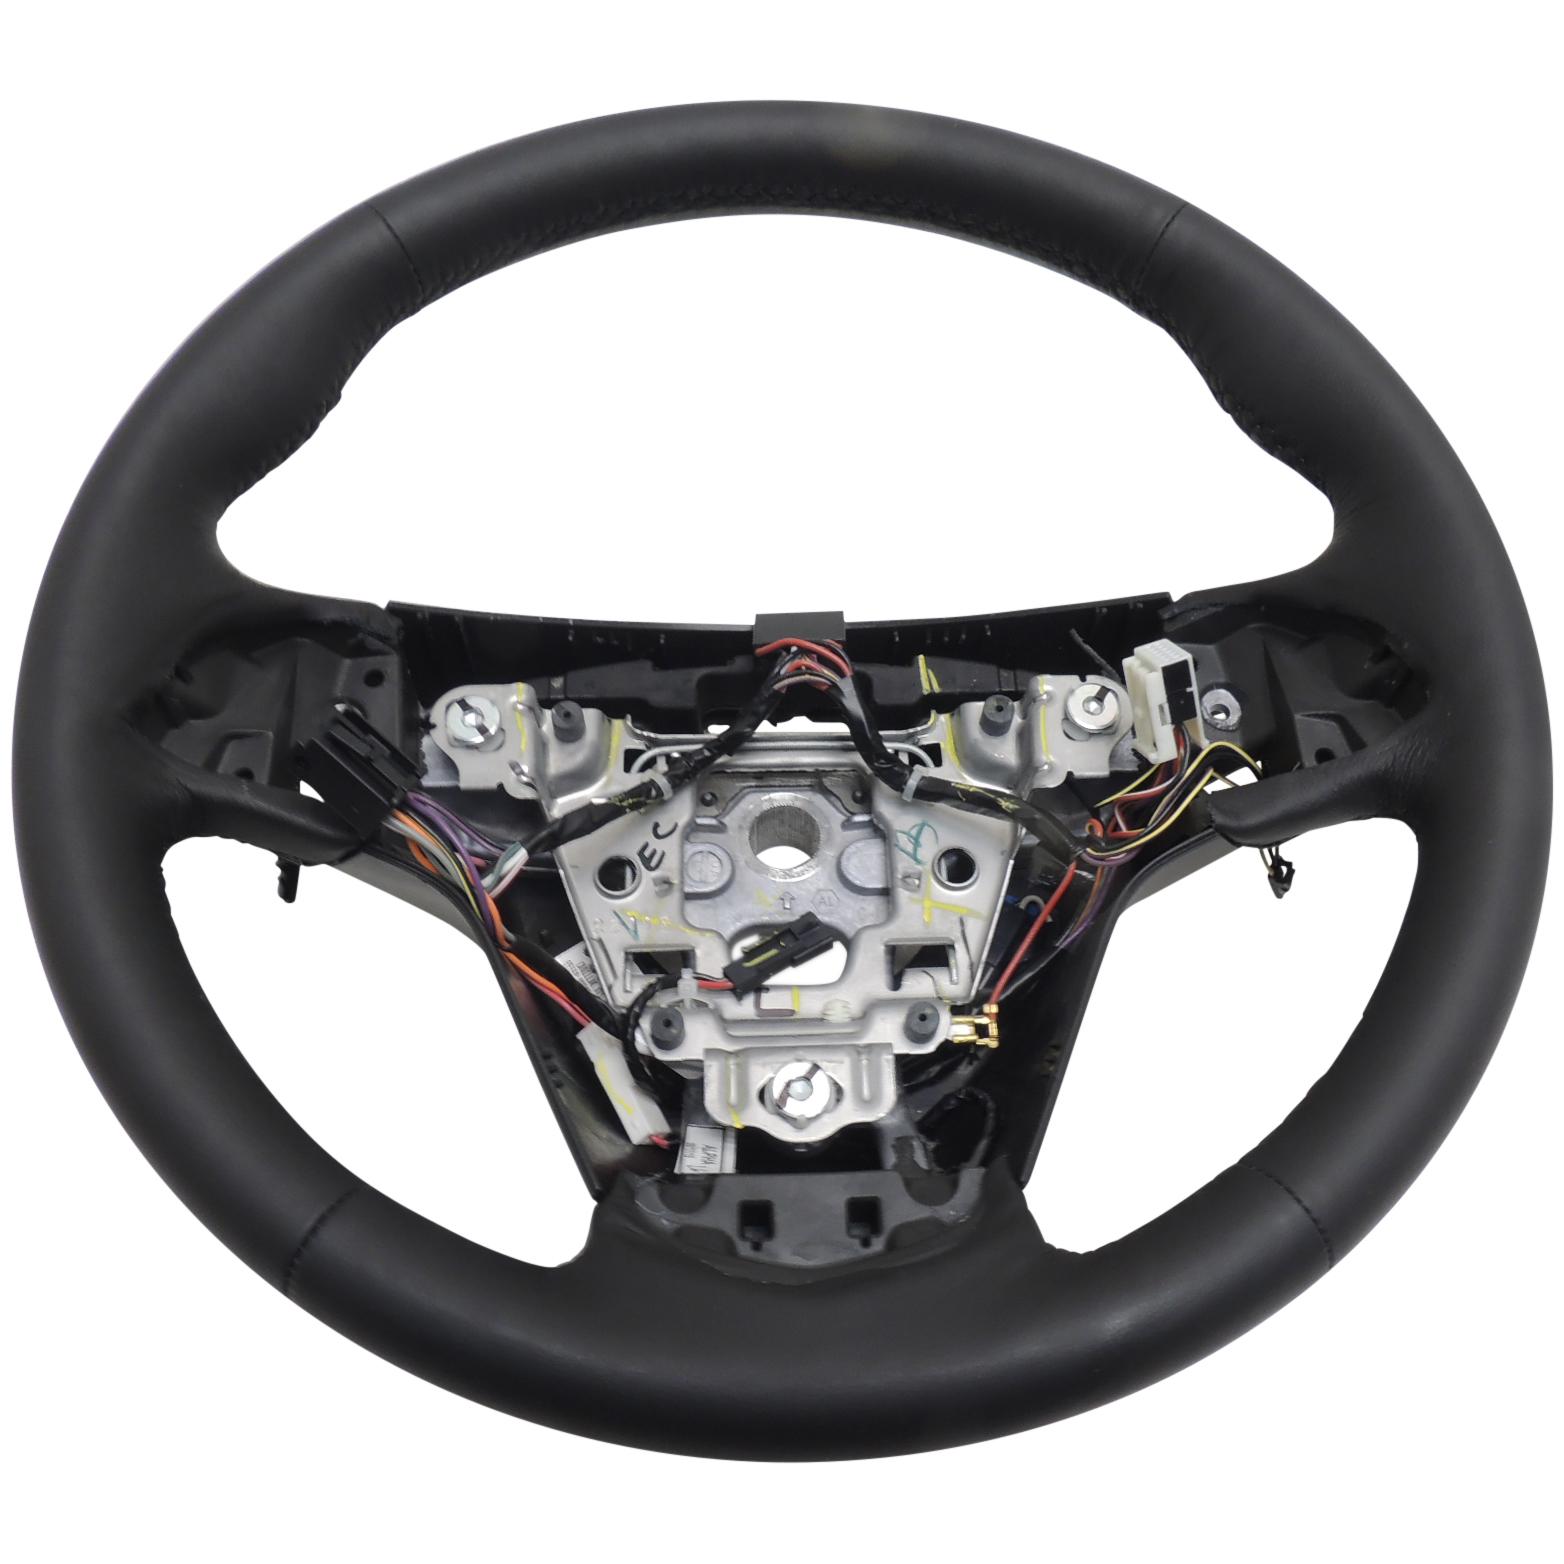 23360213 steering wheel black heated leather new oem gm. Black Bedroom Furniture Sets. Home Design Ideas